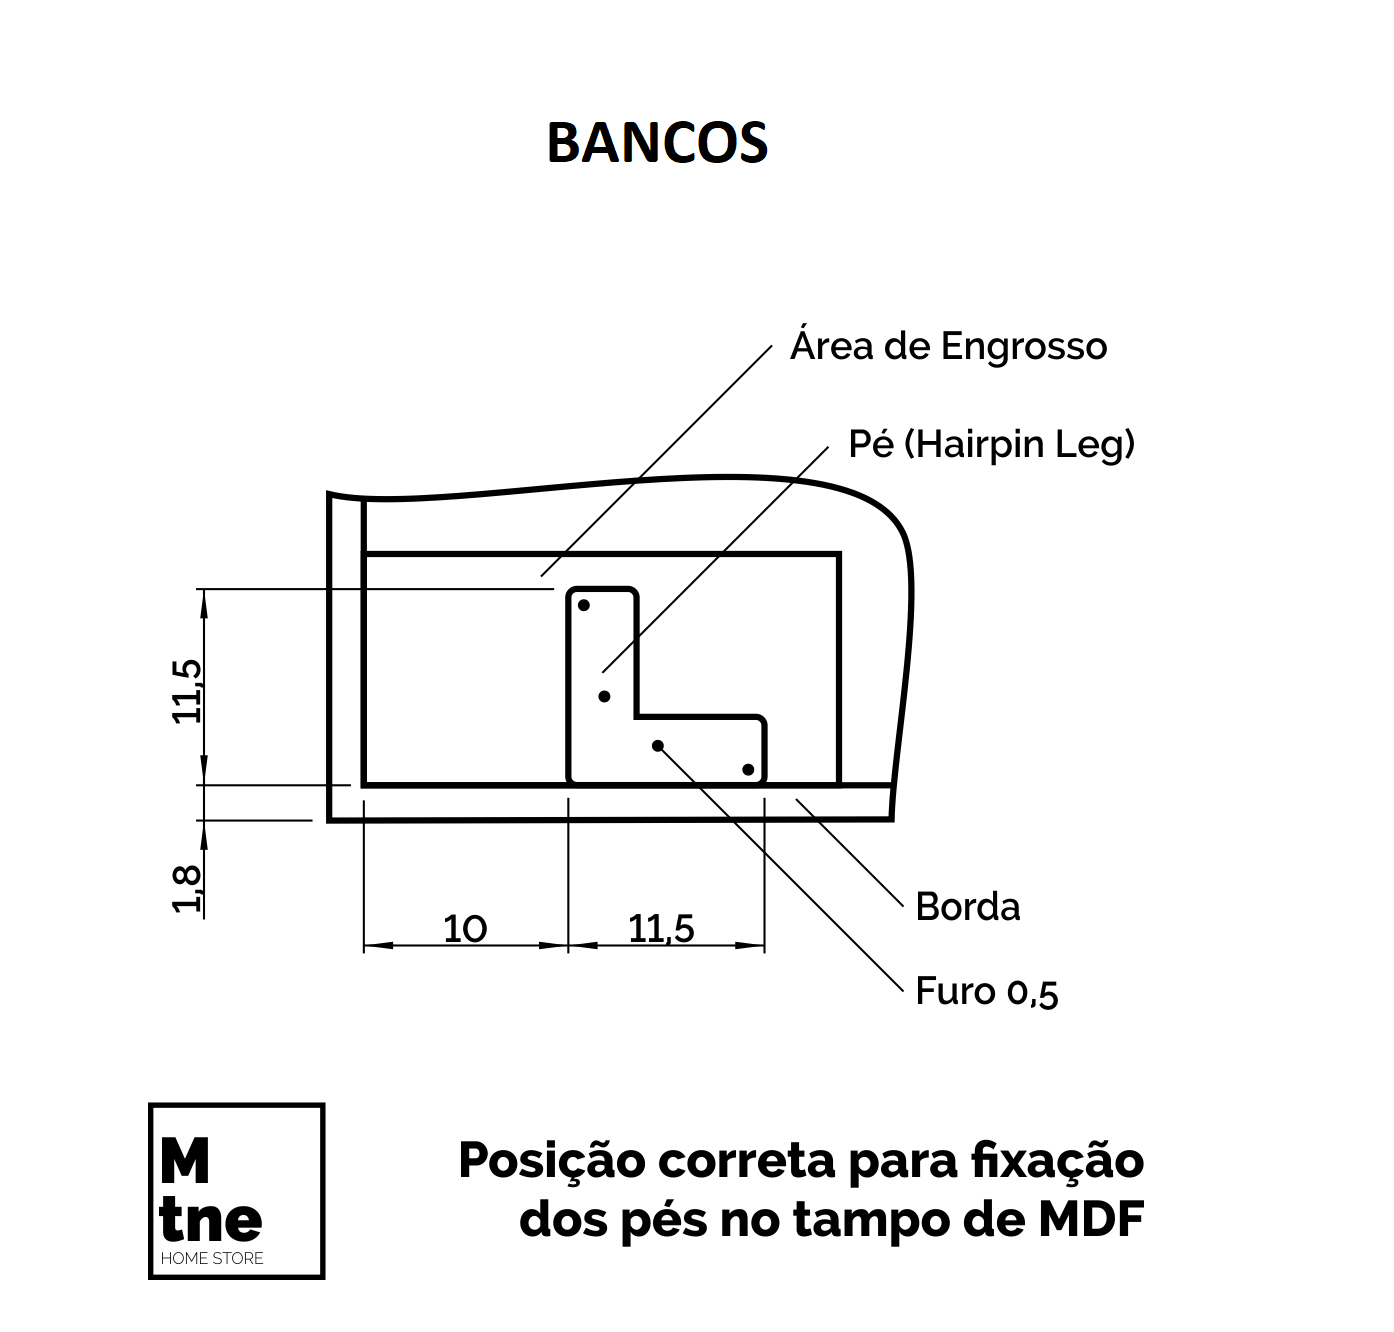 Banco Faia com Hairpin Legs e Tampo 100% MDF  - Mtne Store